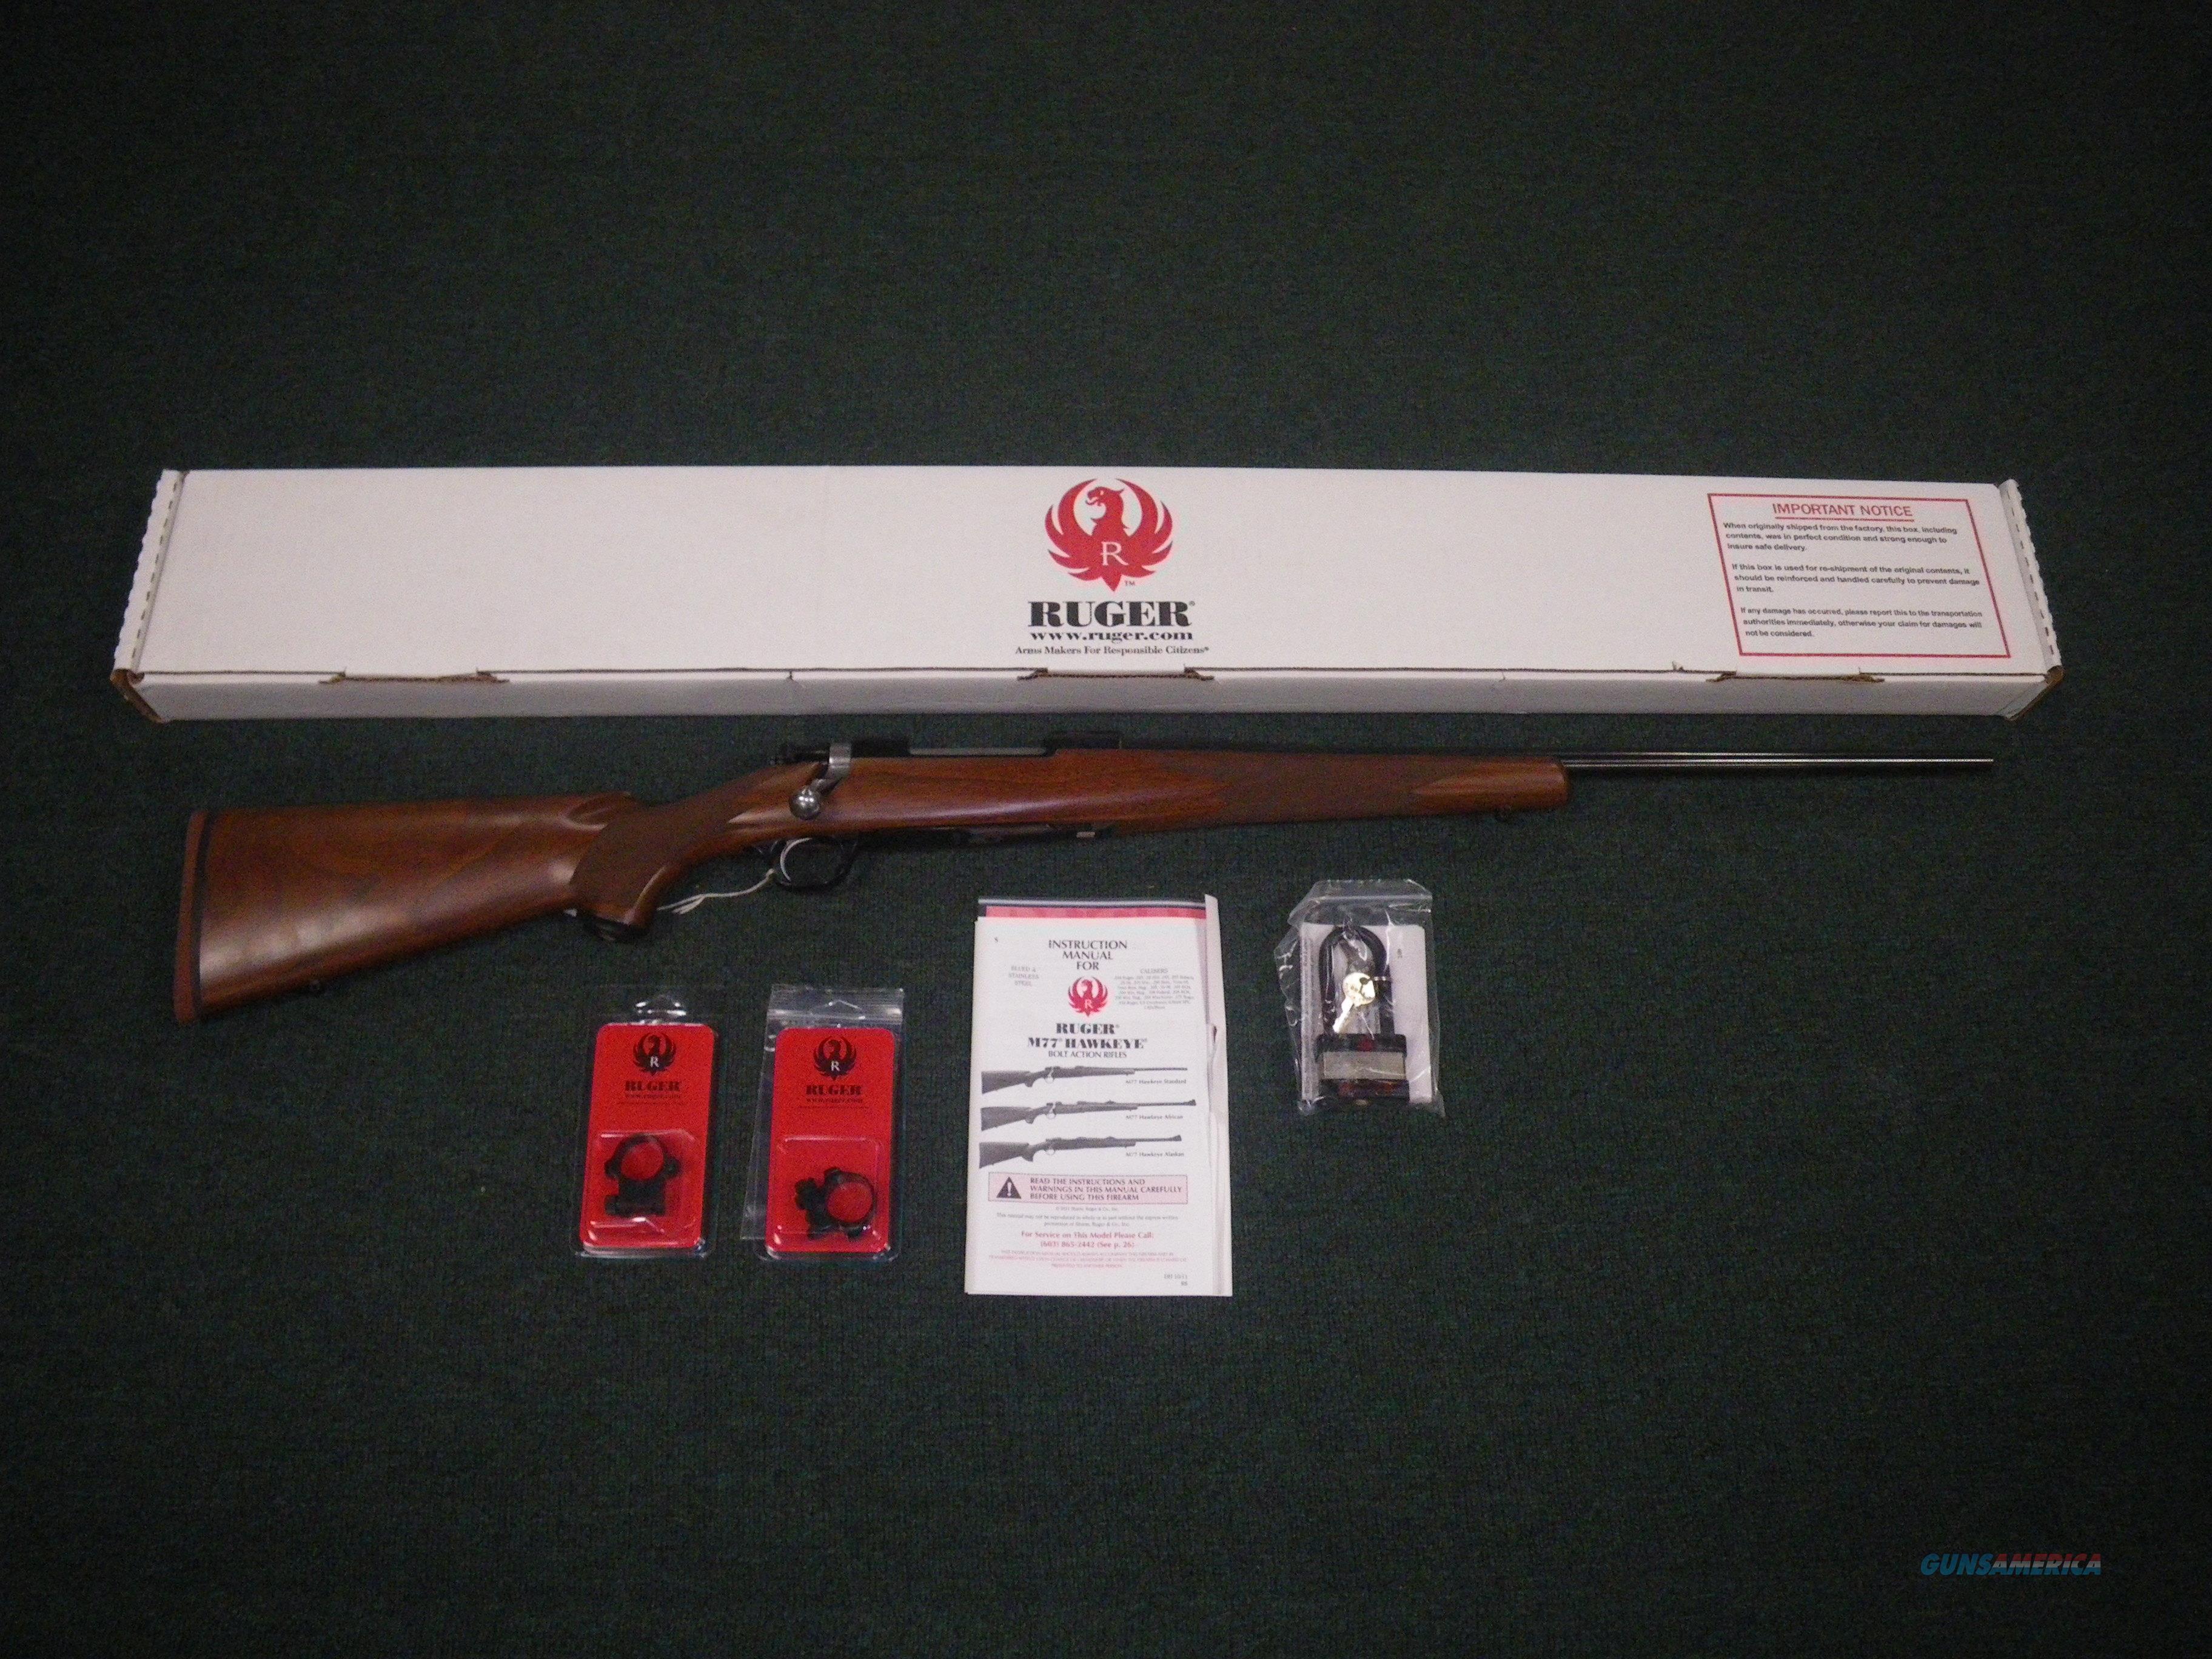 "Ruger M77 Hawkeye Standard Wood/Blue 30-06 Spfld 22"" #37125  Guns > Rifles > Ruger Rifles > Model 77"